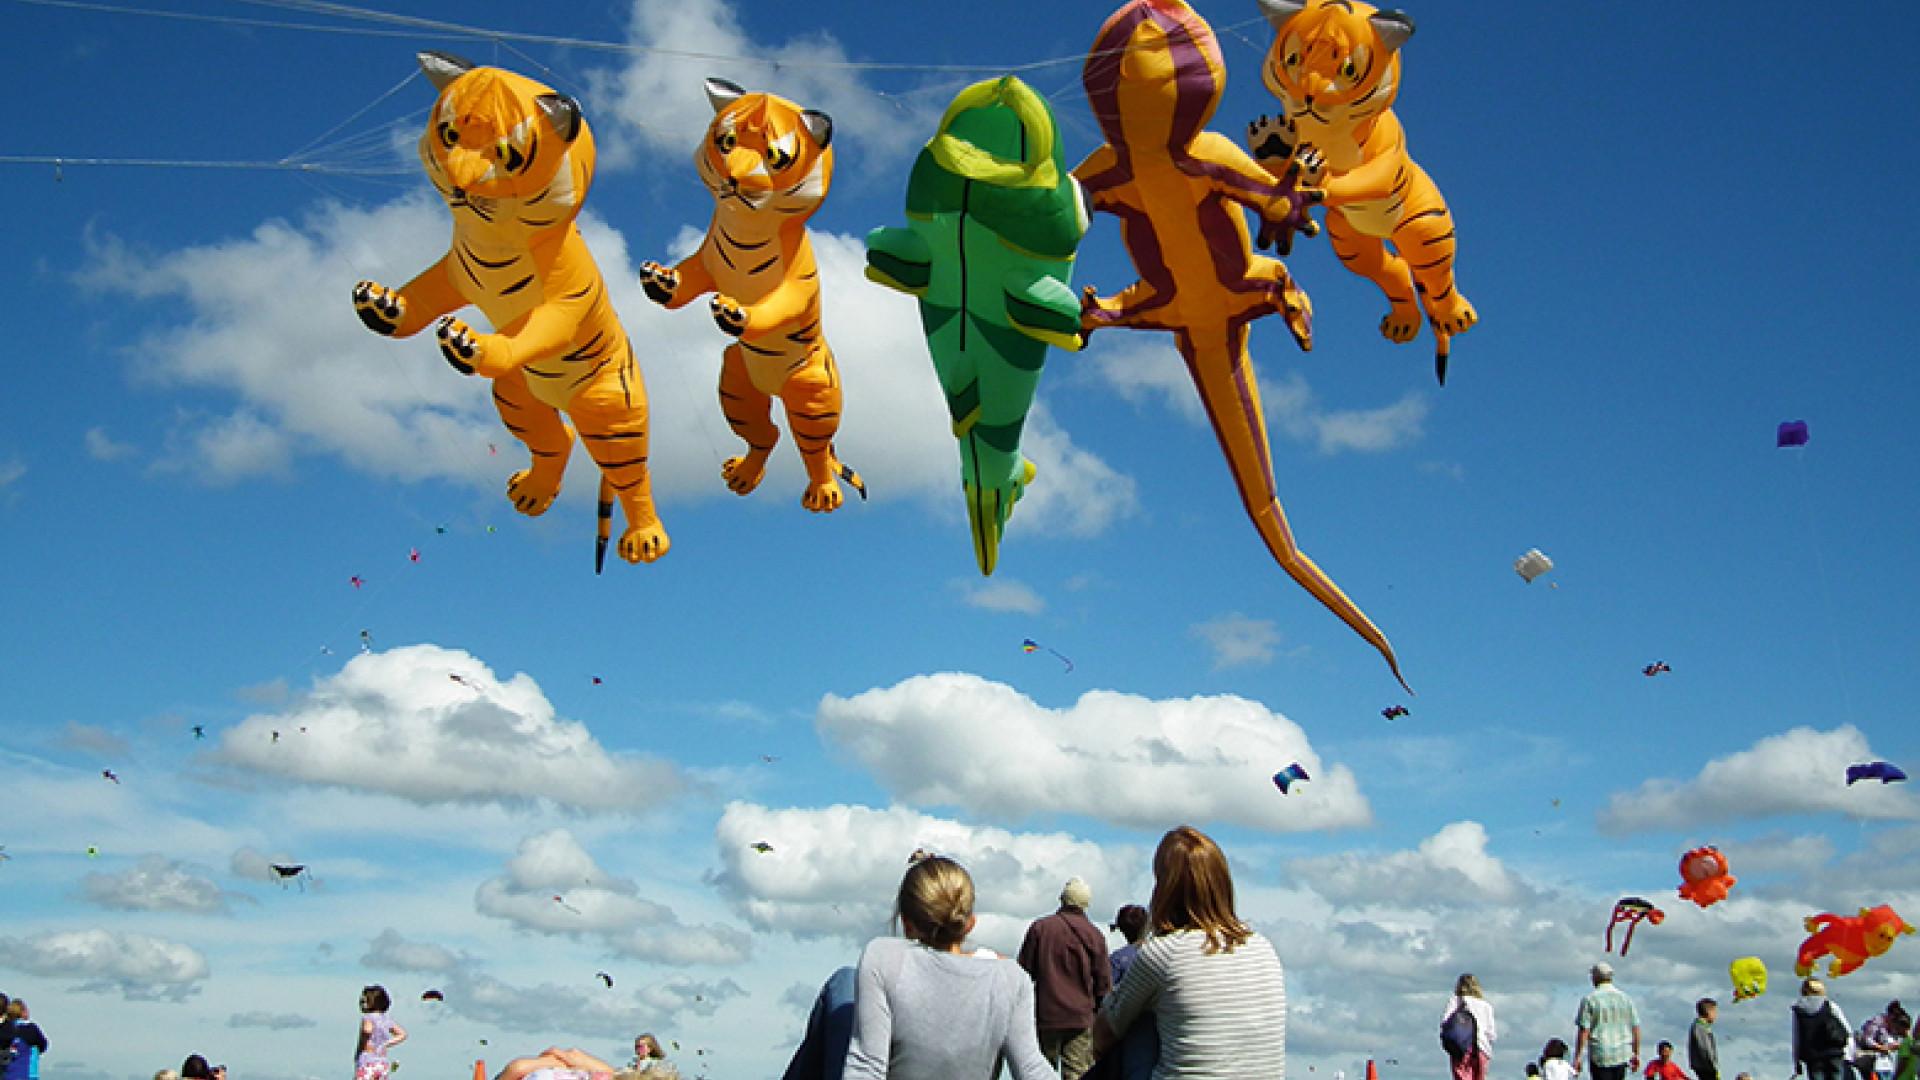 Tigers,-Gecko-&-Fish-with-spectators-(credit-Myk-Garton)